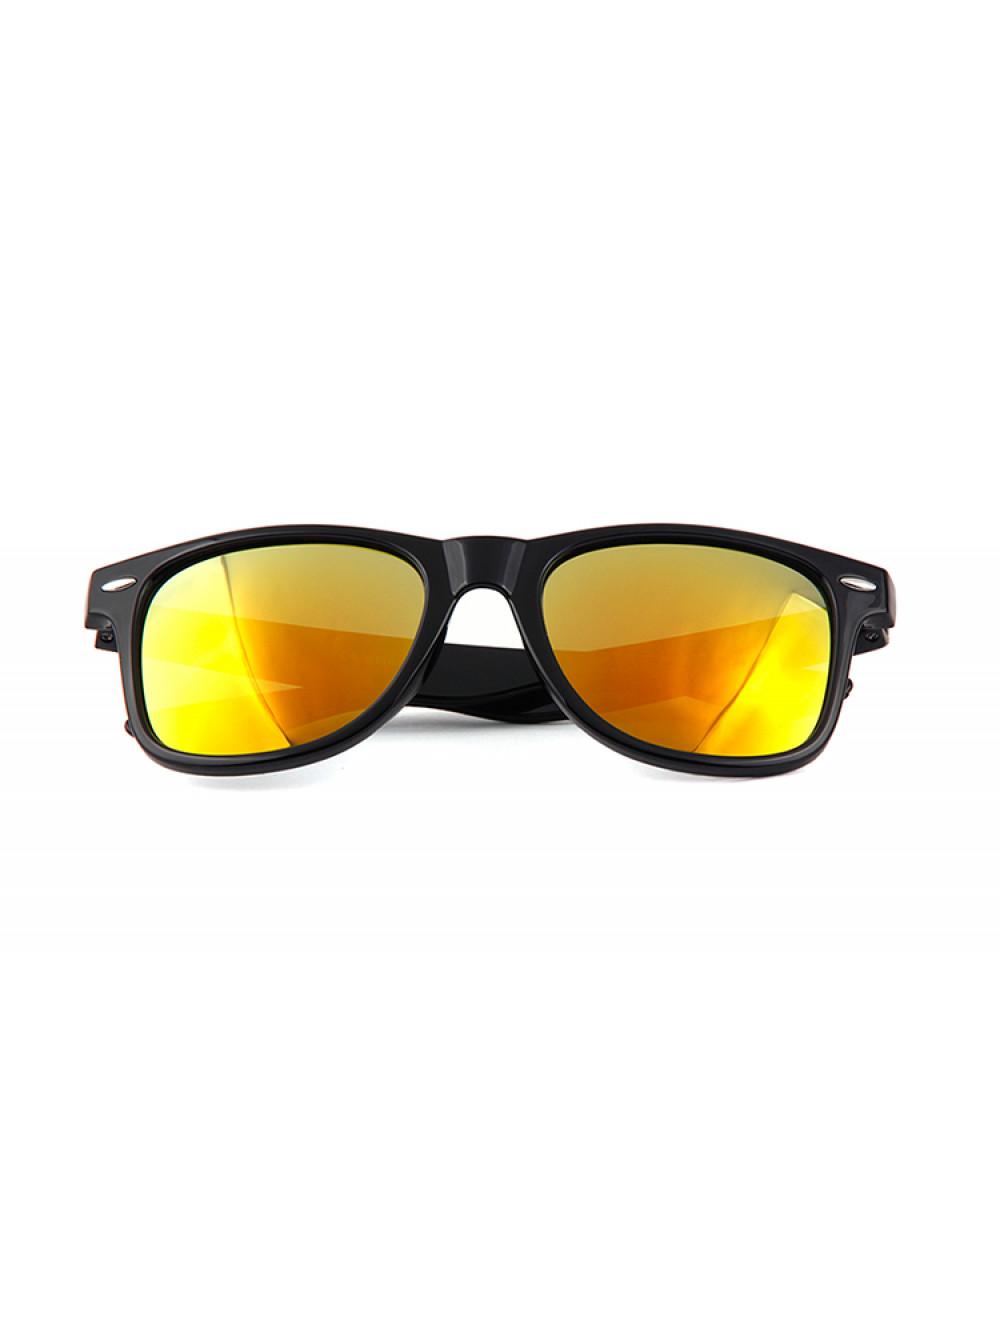 Slnečné okuliare Wayfarer Classic Orange · Slnečné okuliare Wayfarer  Classic Orange ... e548cf2f441